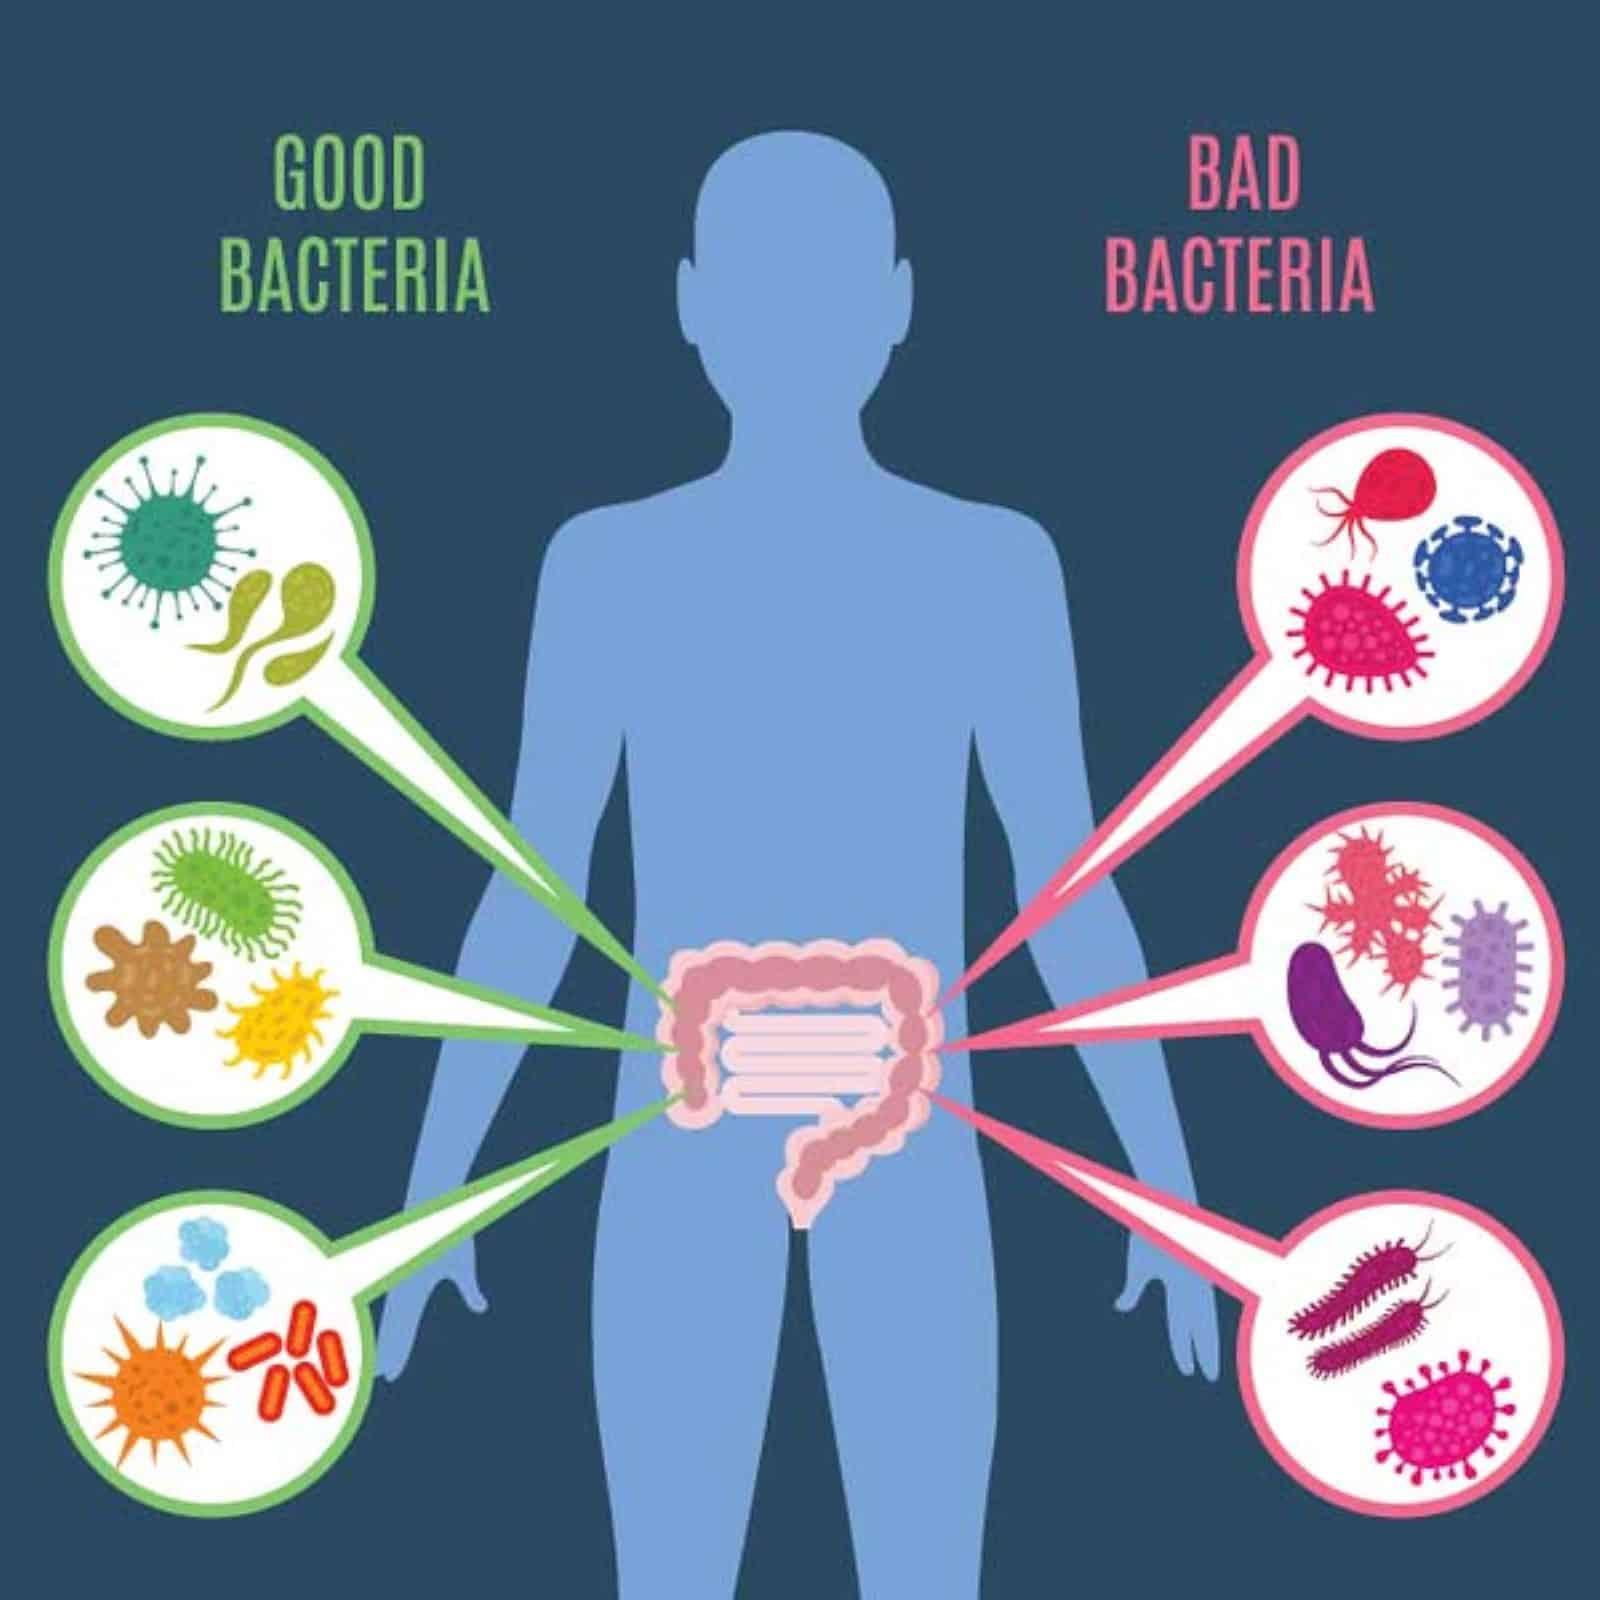 integrative health: good and bad bacteria classification